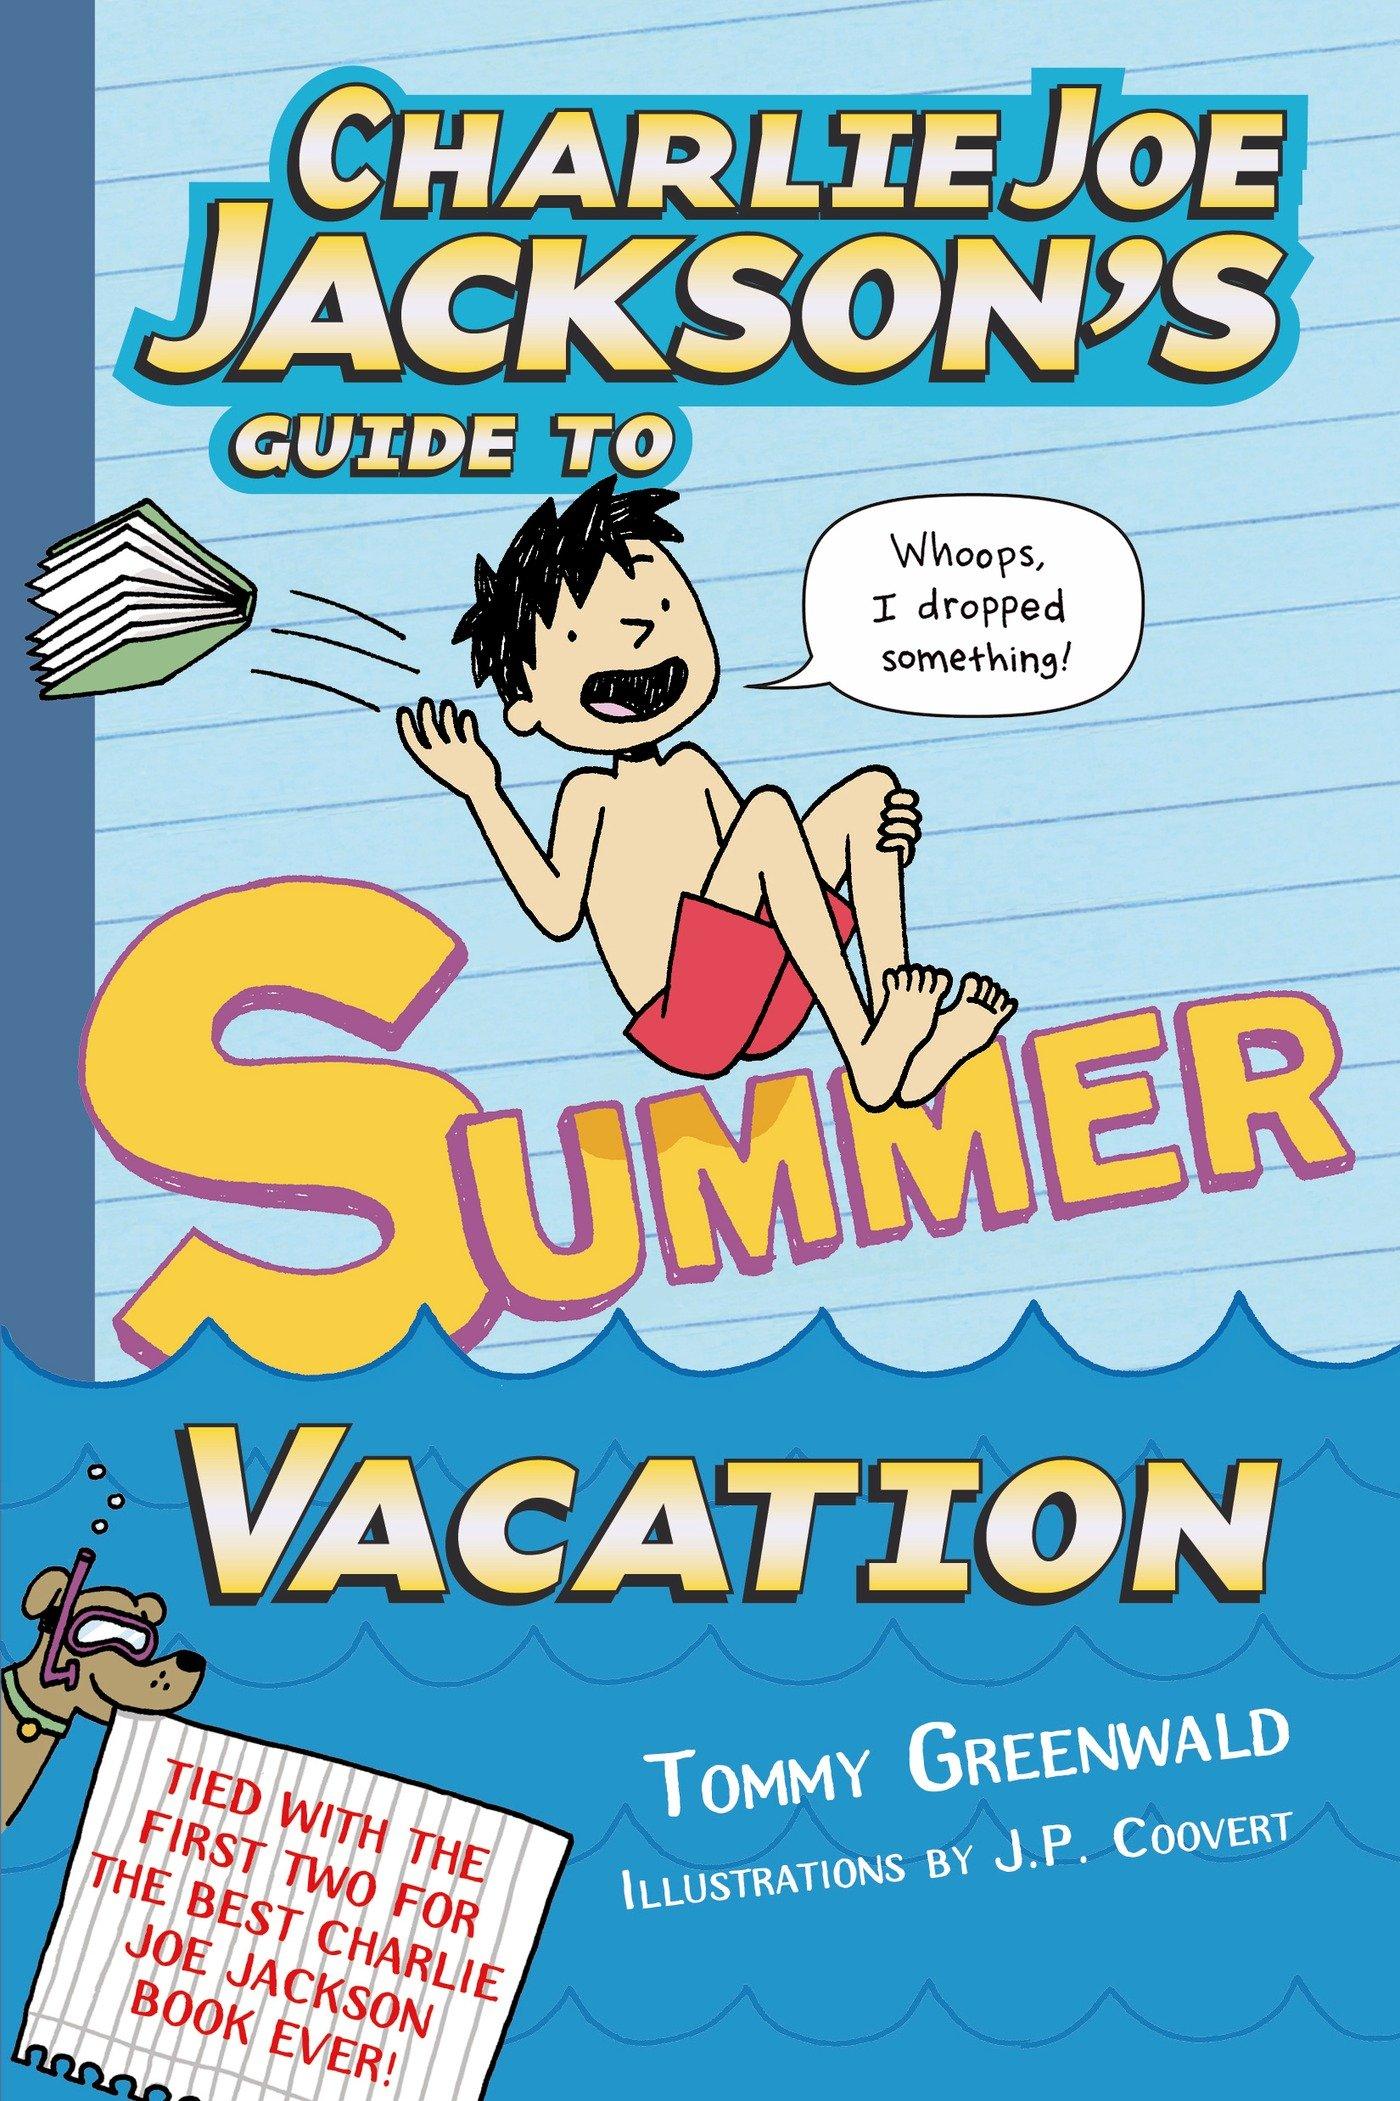 Charlie Joe Jackson's Guide to Summer Vacation (Charlie Joe Jackson Series) ebook